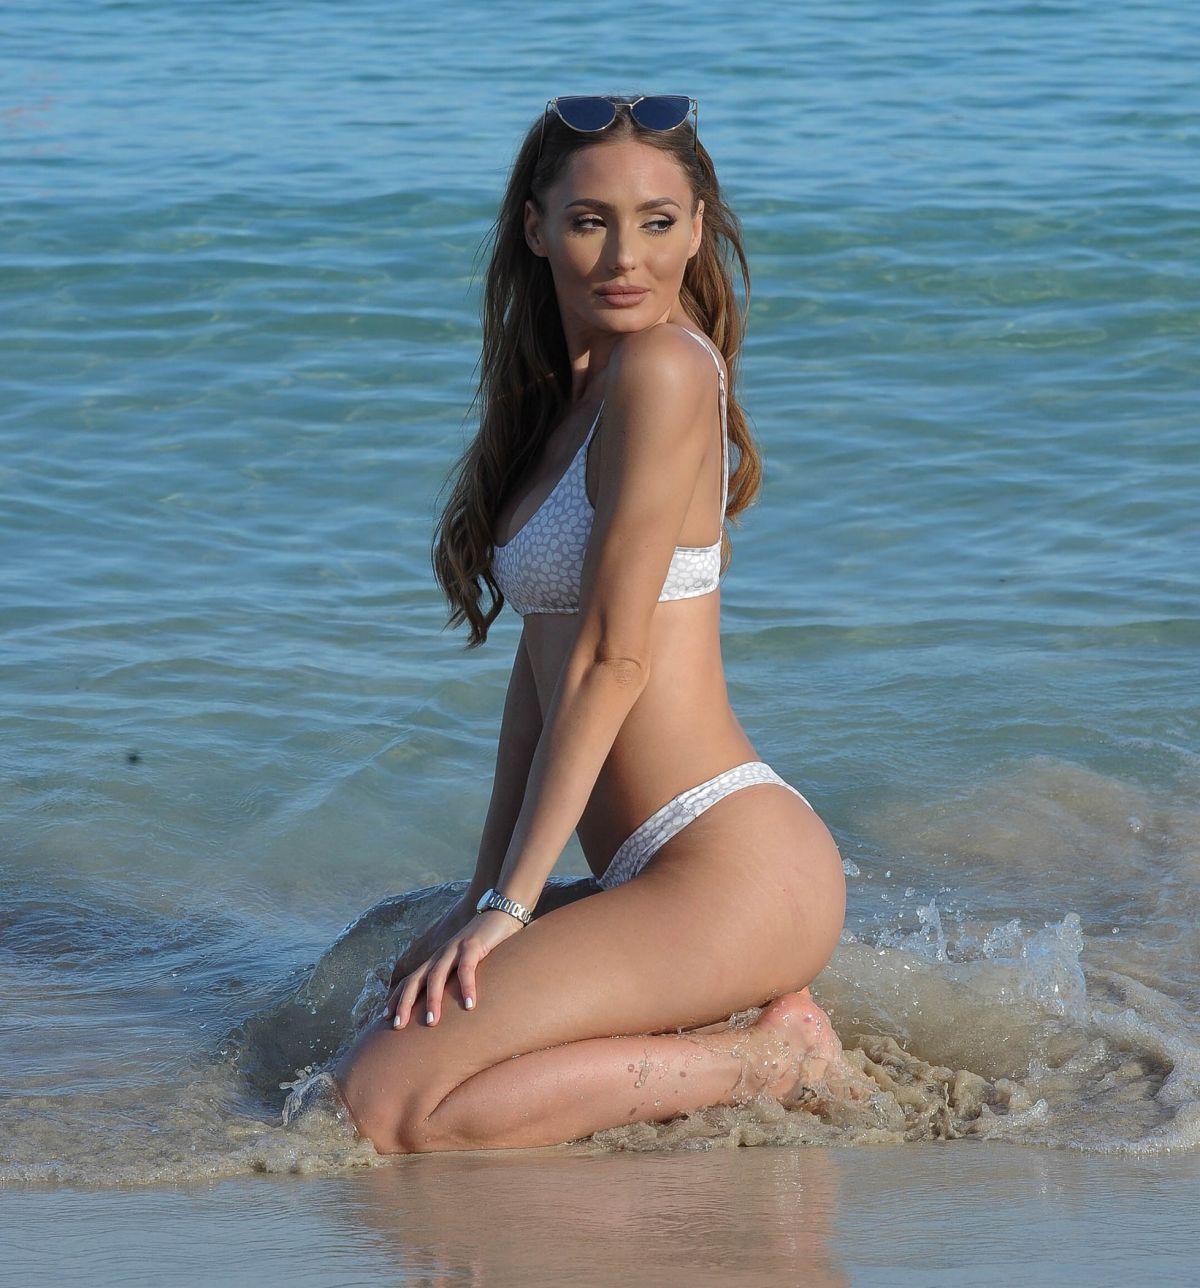 Bikini Tanya Clarke nudes (63 photos), Sexy, Is a cute, Twitter, braless 2018